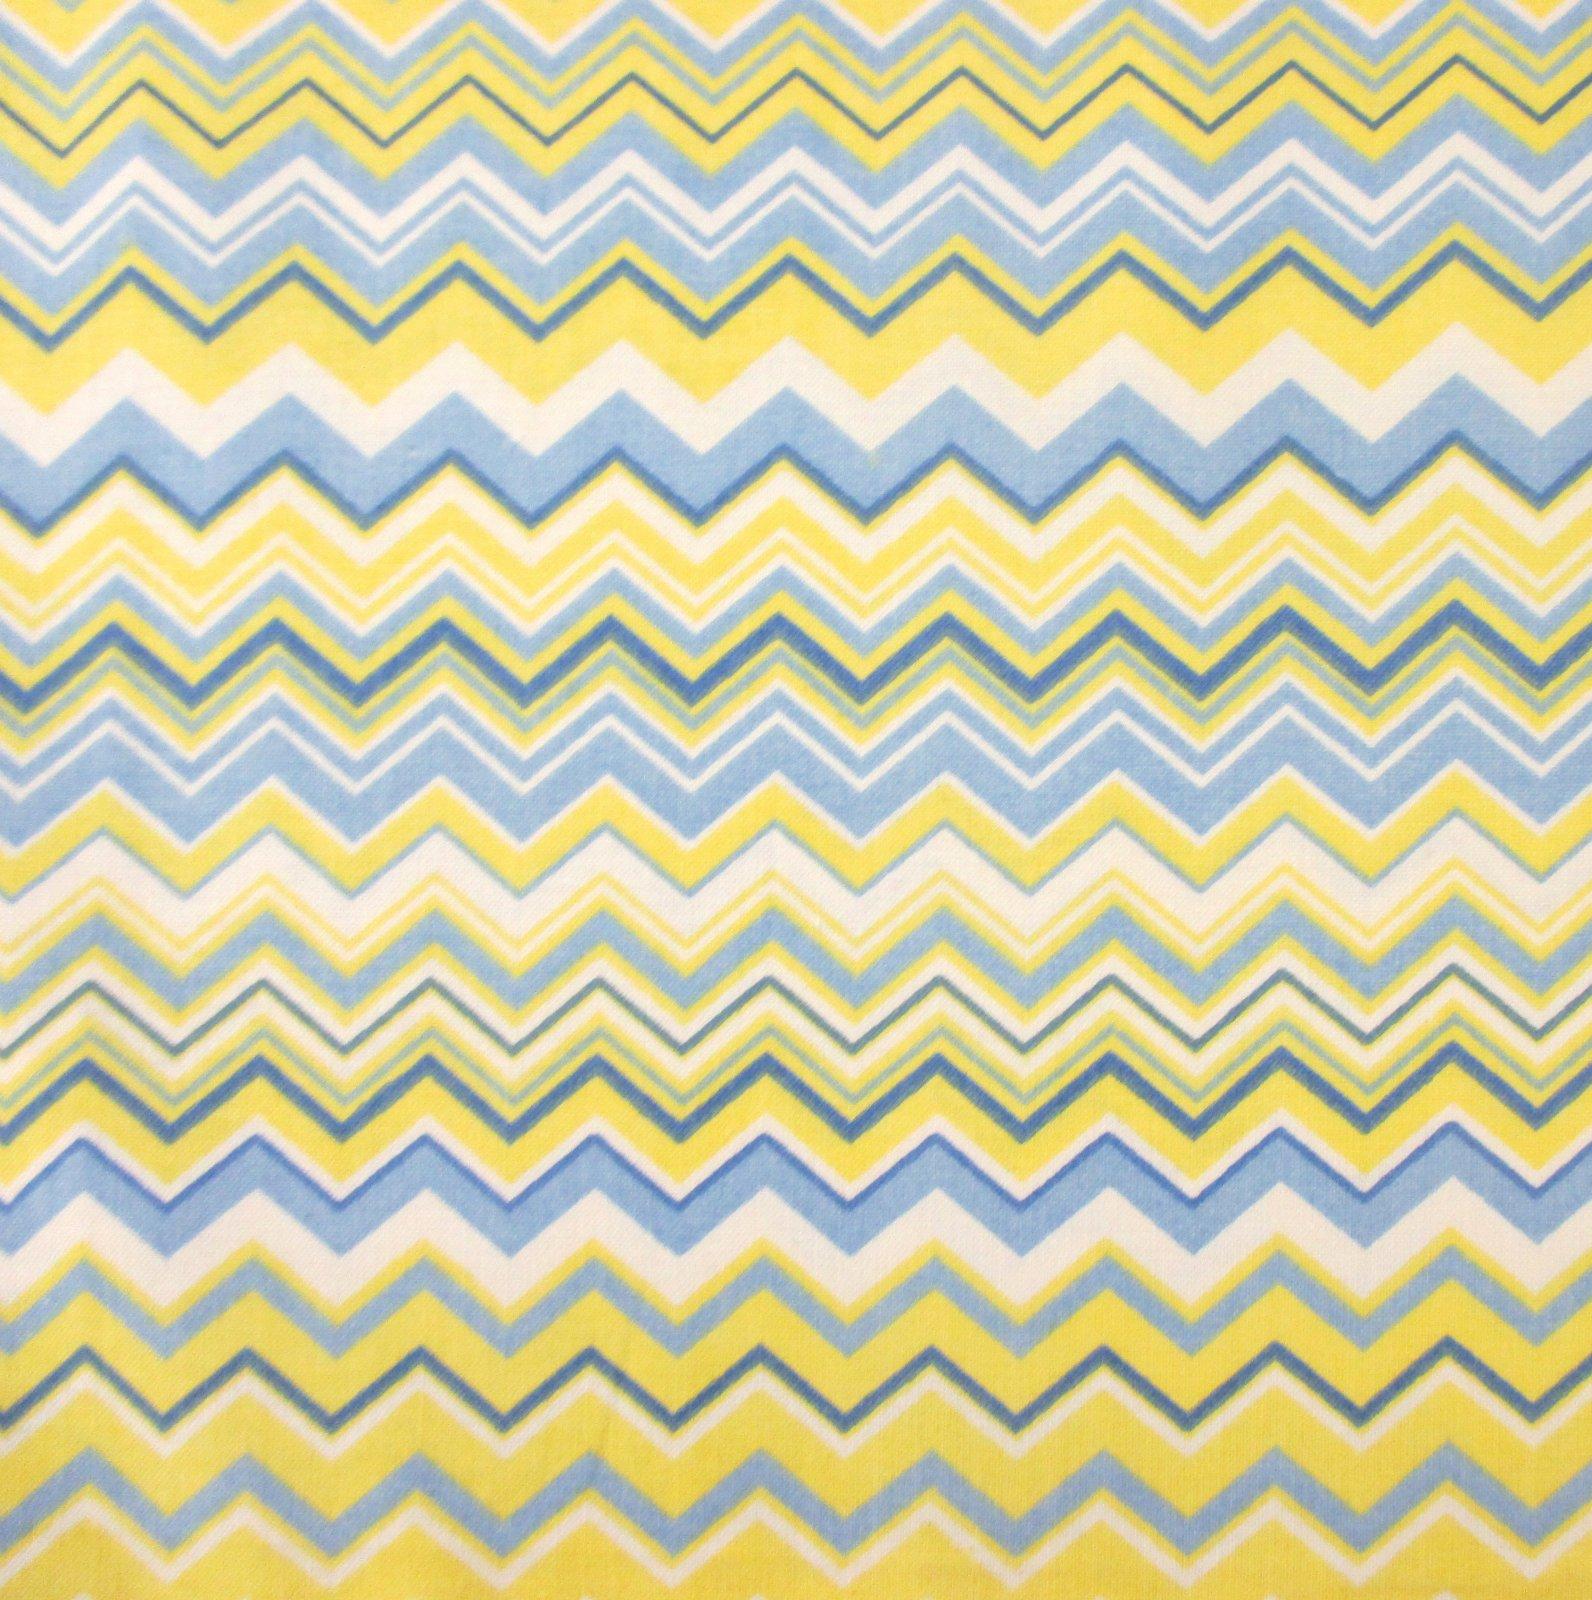 A.E. Nathan - Chevron - Blue/Yellow/White